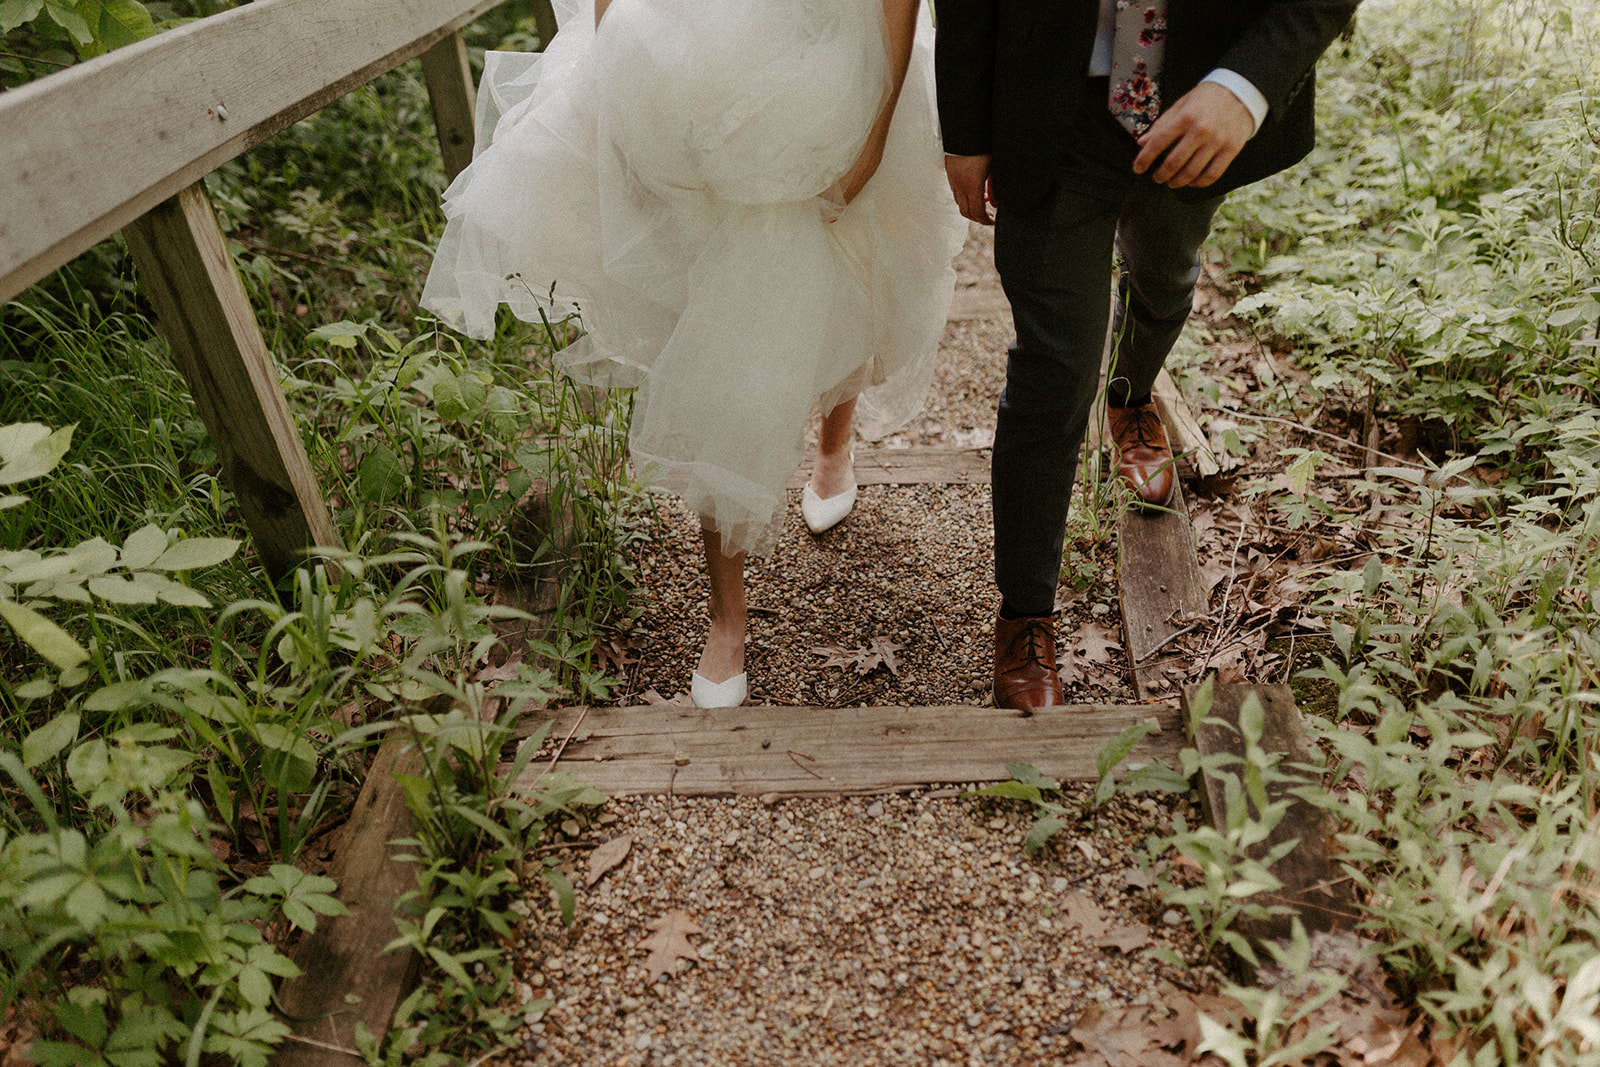 camp_wokanda_peoria_illinois_wedding_photographer_wright_photographs_bliese_0728.jpg